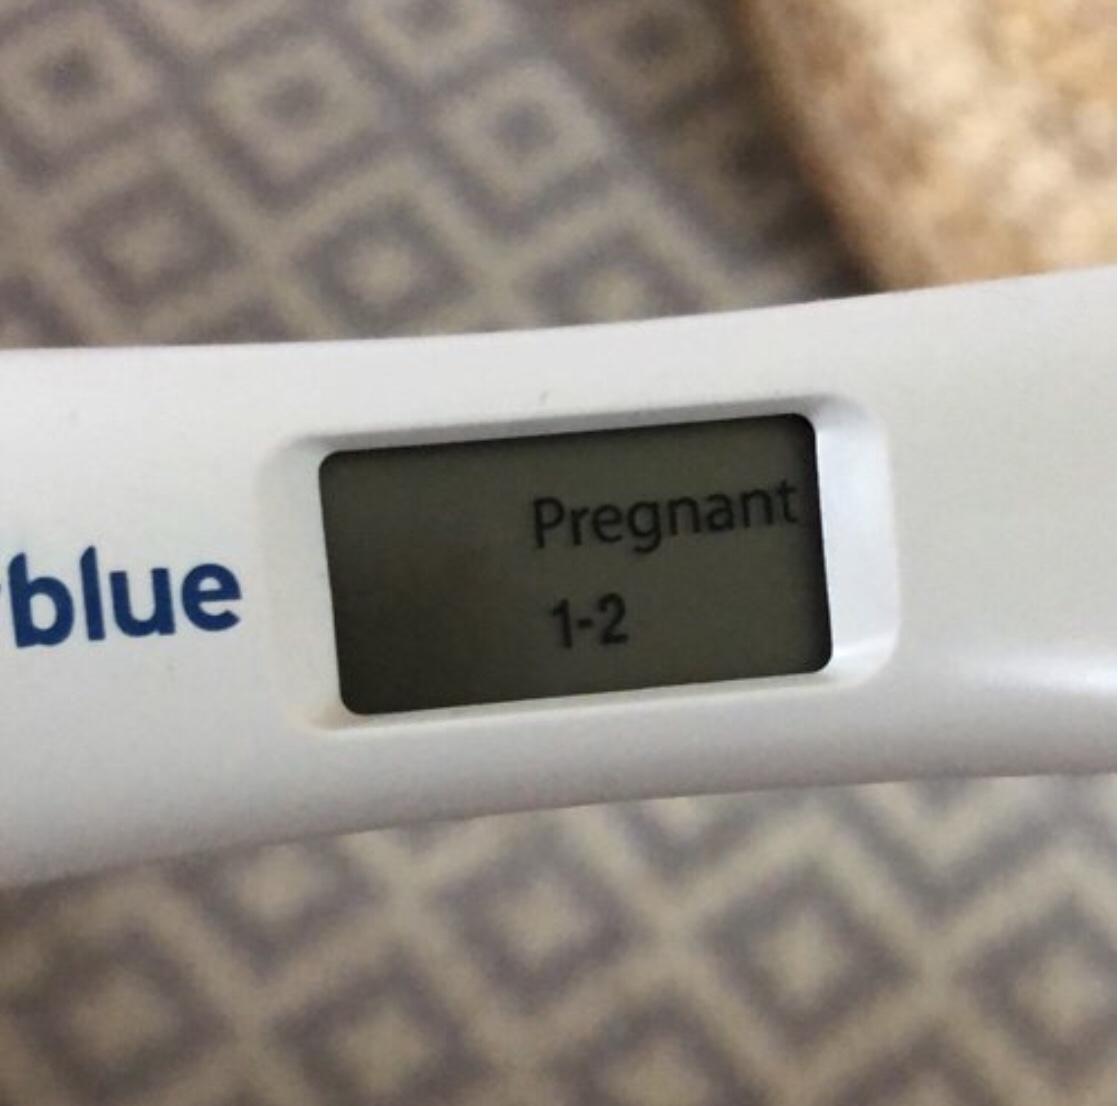 very faint line clear blue pregnancy test